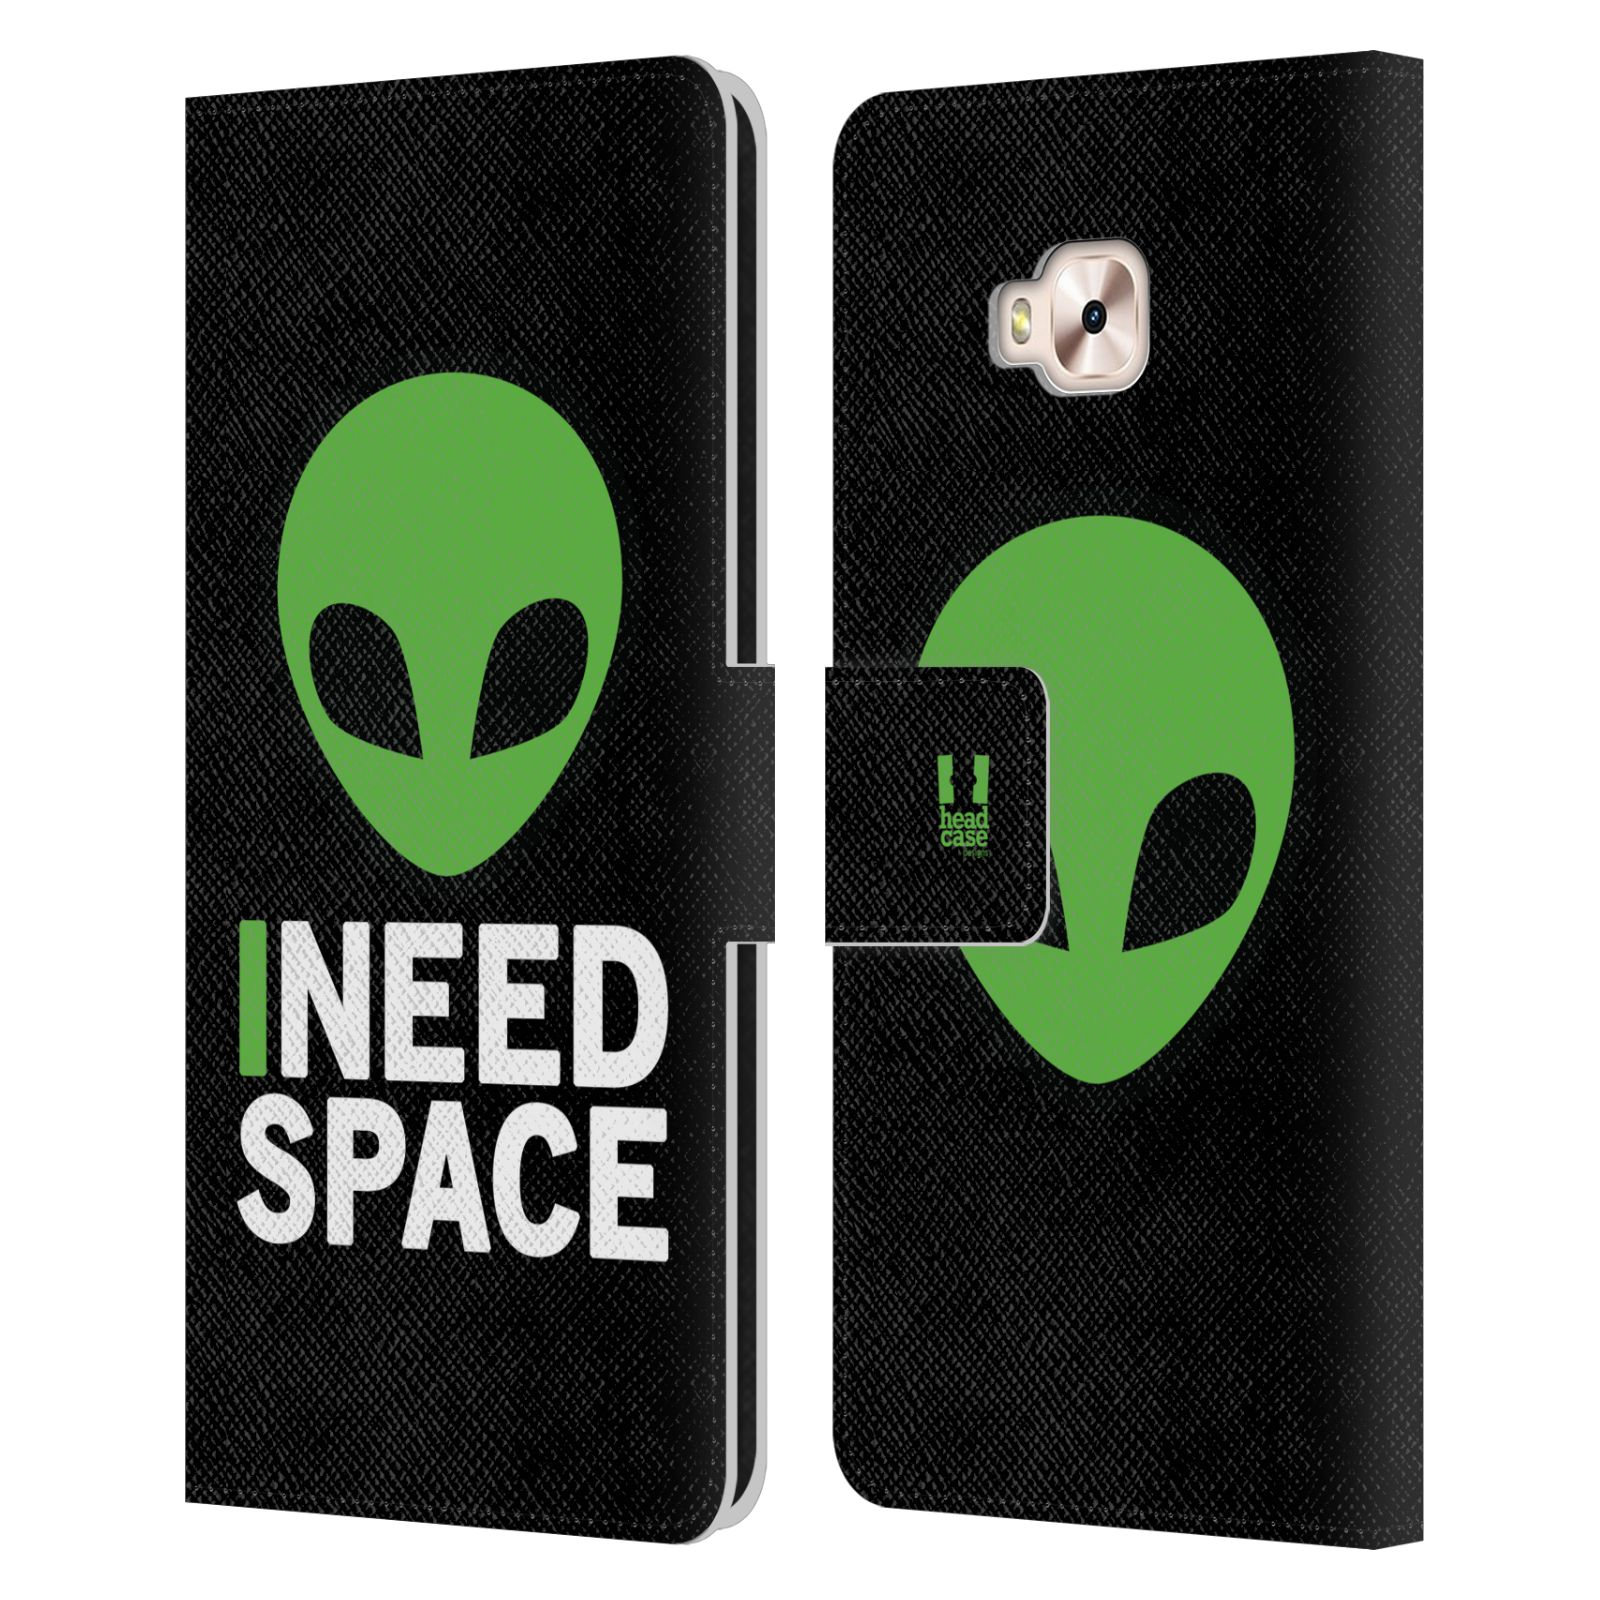 Pouzdro na mobil Asus Zenfone 4 Selfie Pro ZD552KL - Head Case - zelený mimozemšťan Ufoun